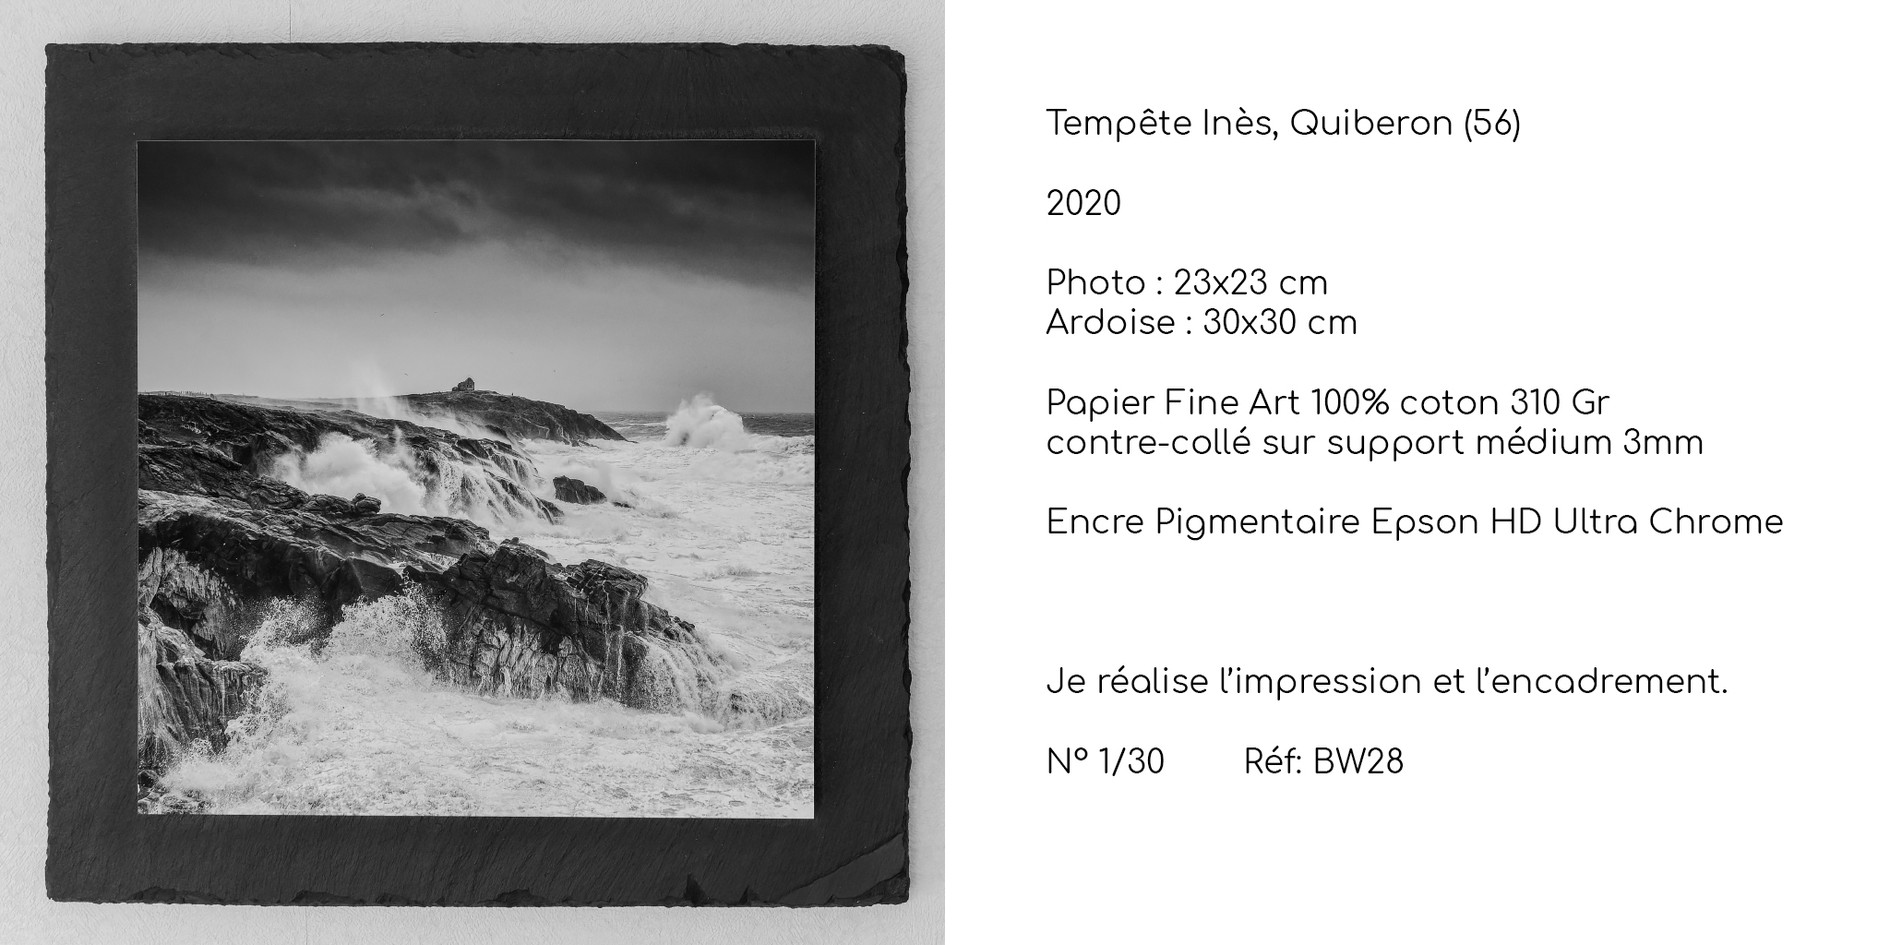 Tempête Inès, Quiberon (56)